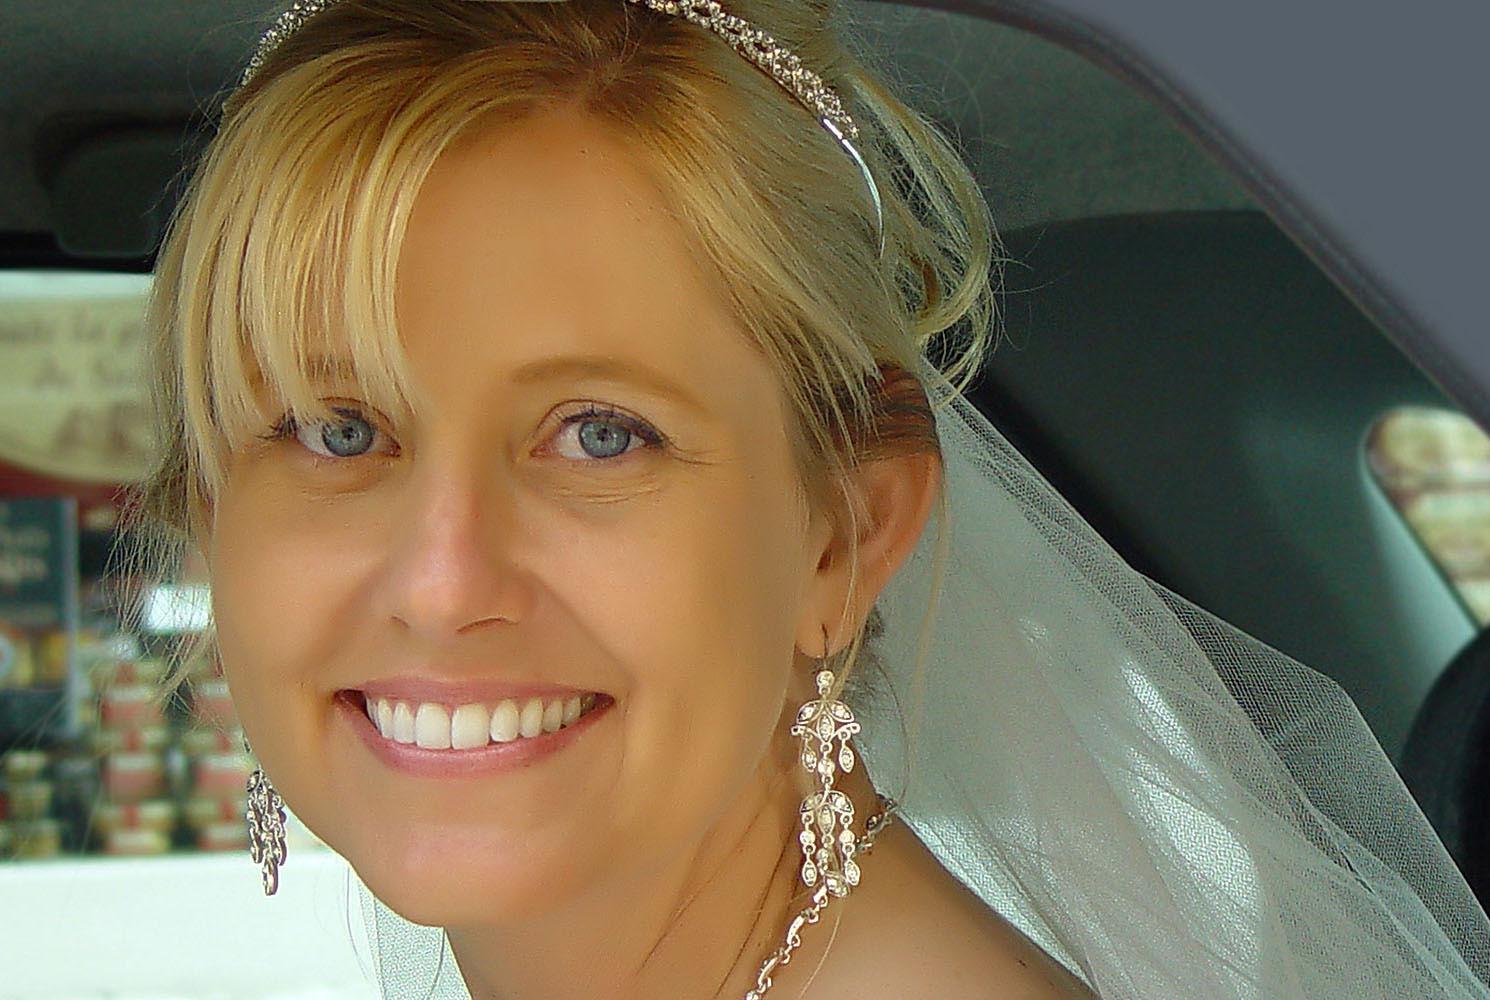 Portrait de la mariee avec bijoux en diamants et perles